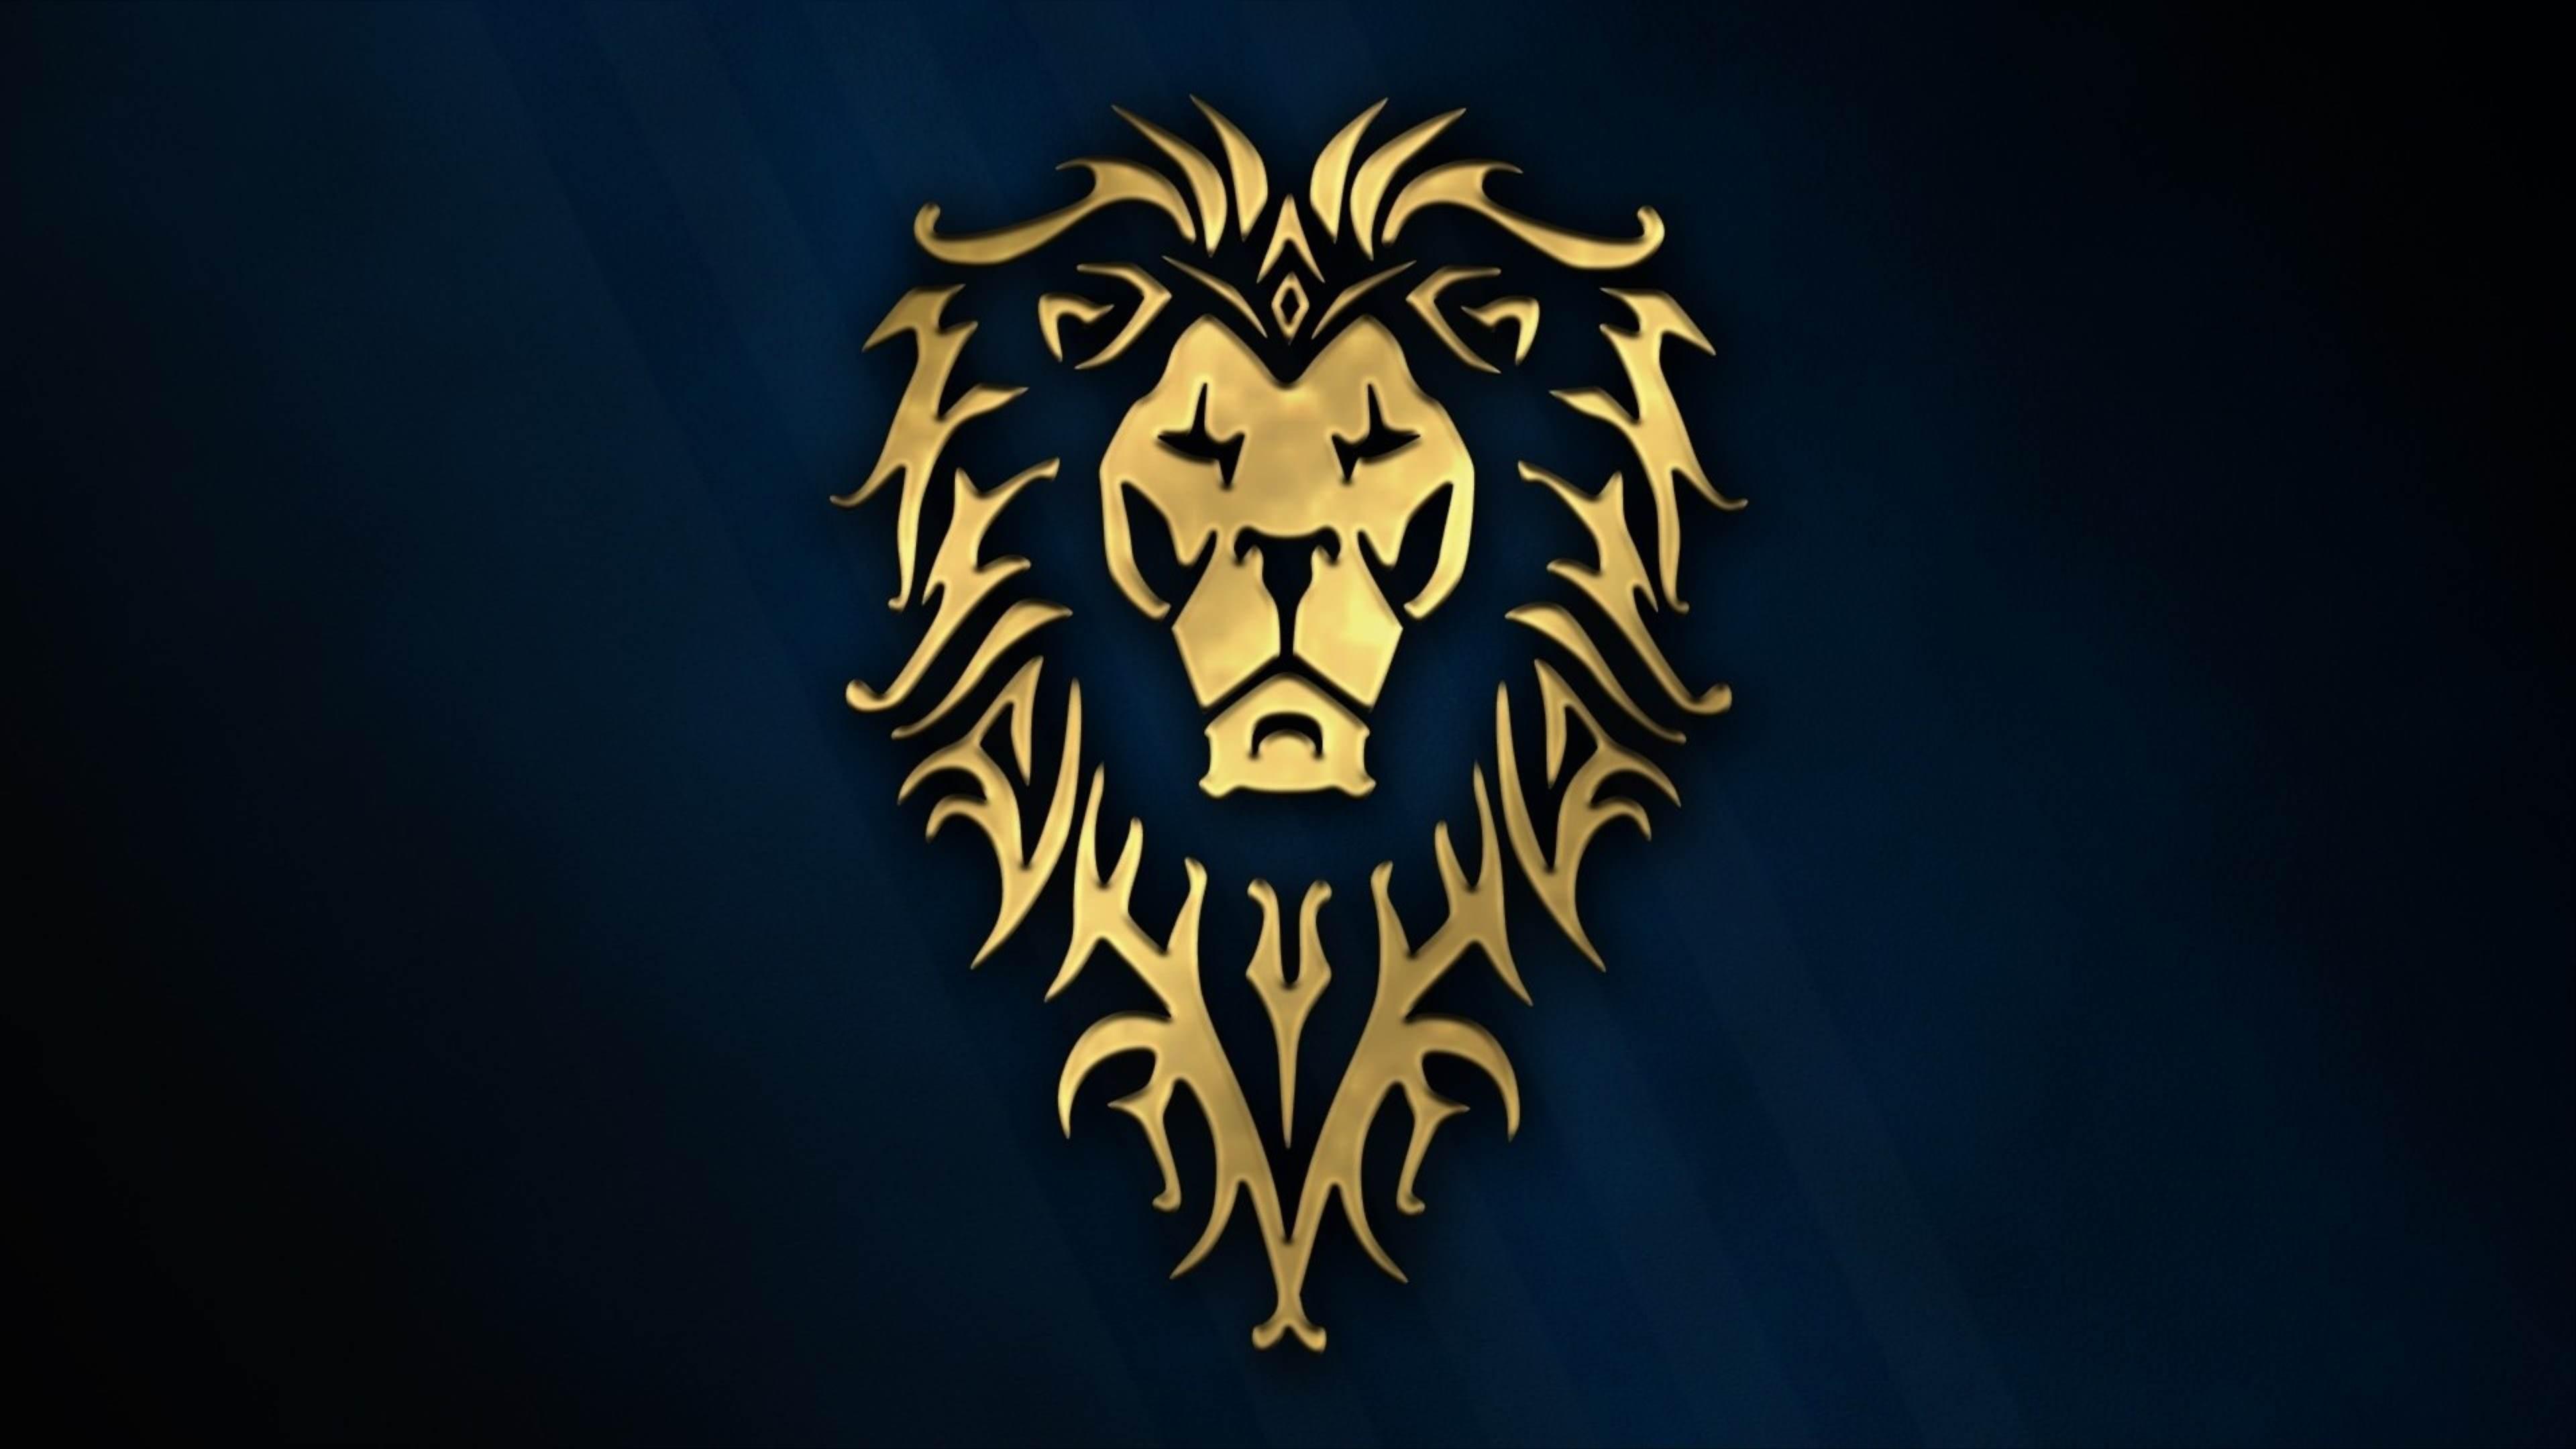 1600x1200 Warcraft Movie Logo 1600x1200 Resolution Hd 4k